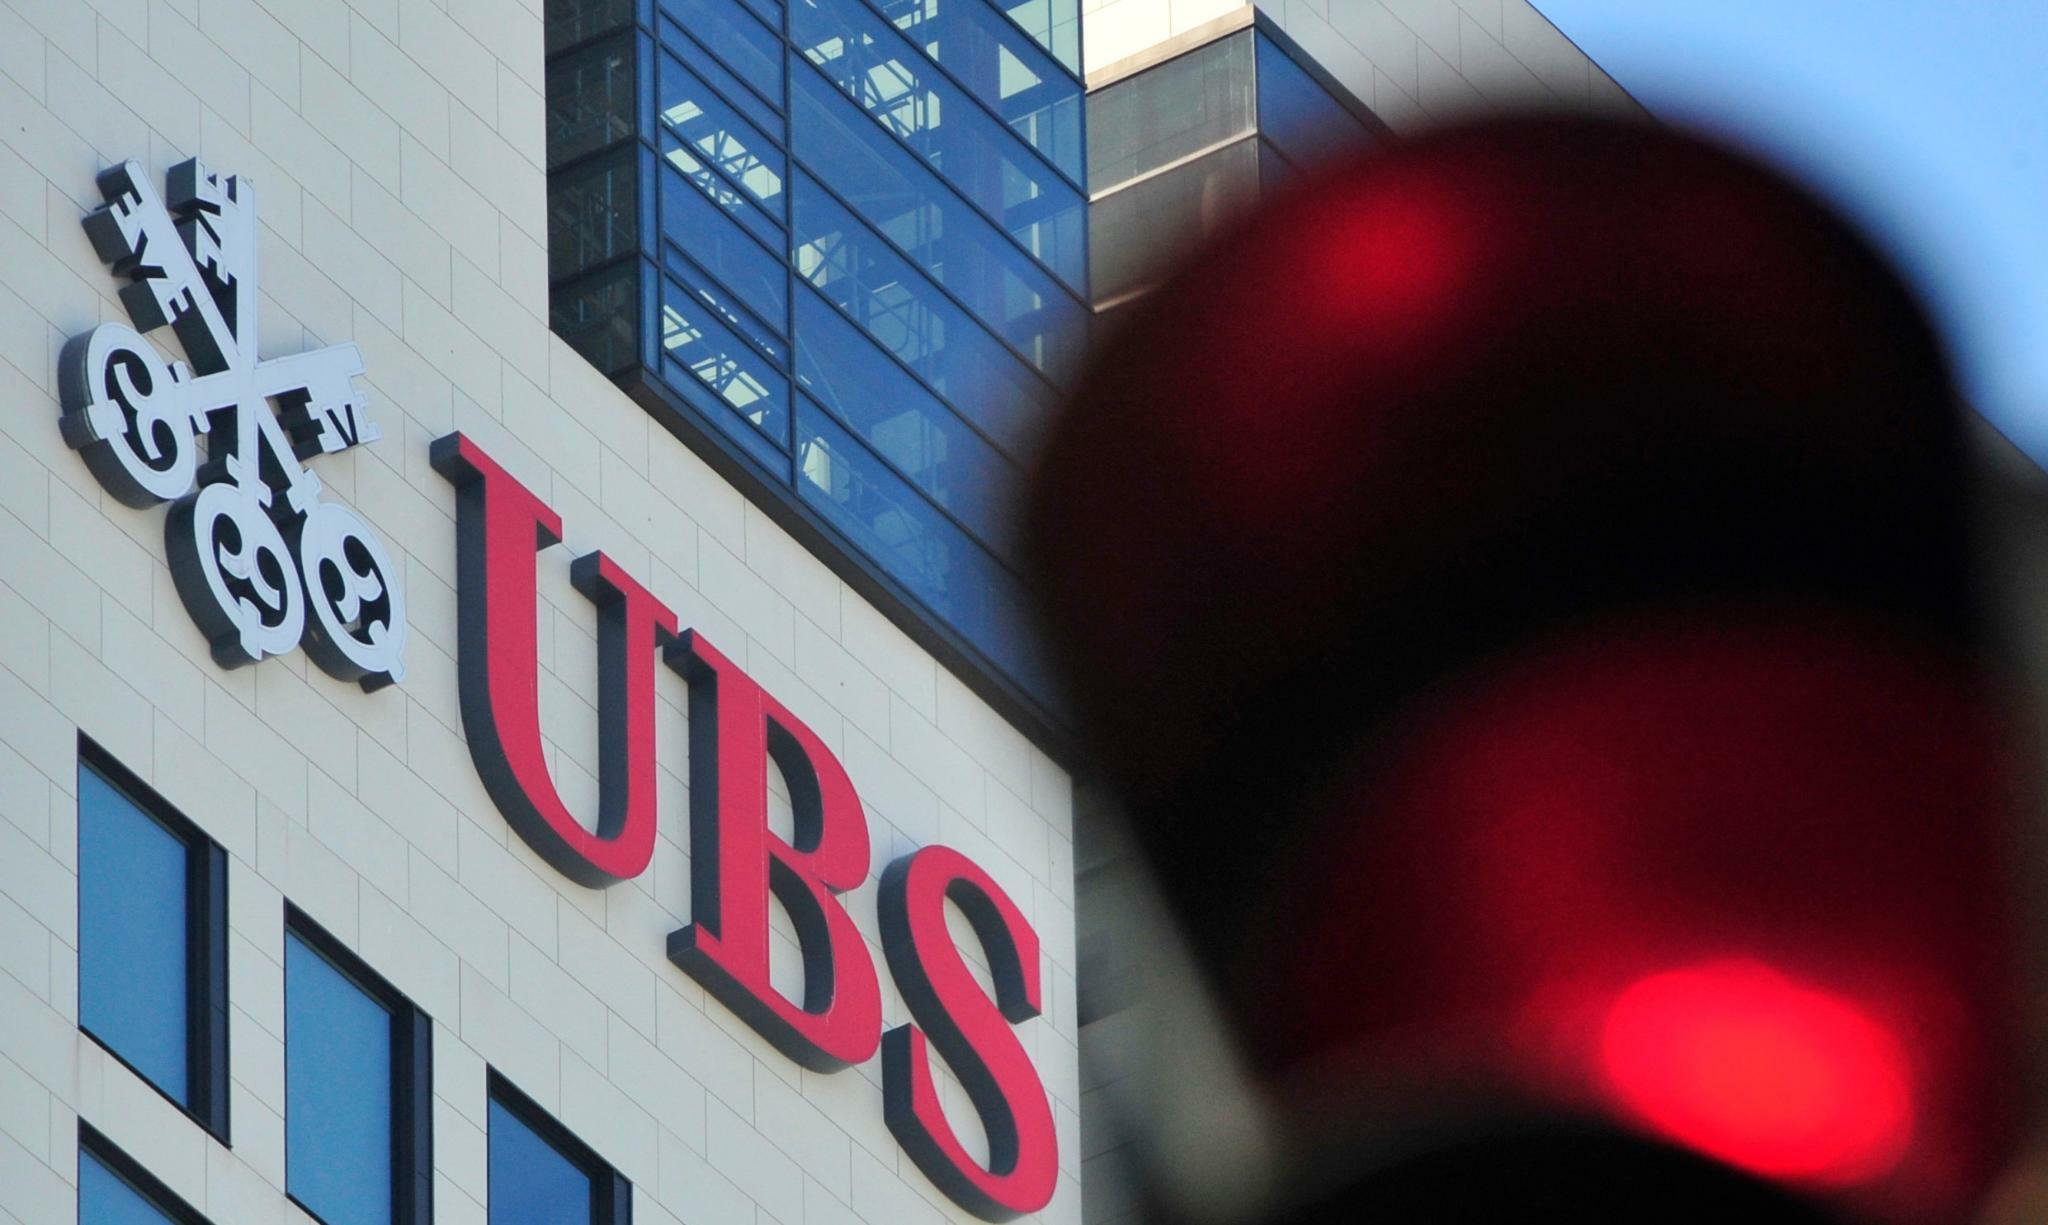 UBS baut nach Gewinnrückgang Investmentsparte um